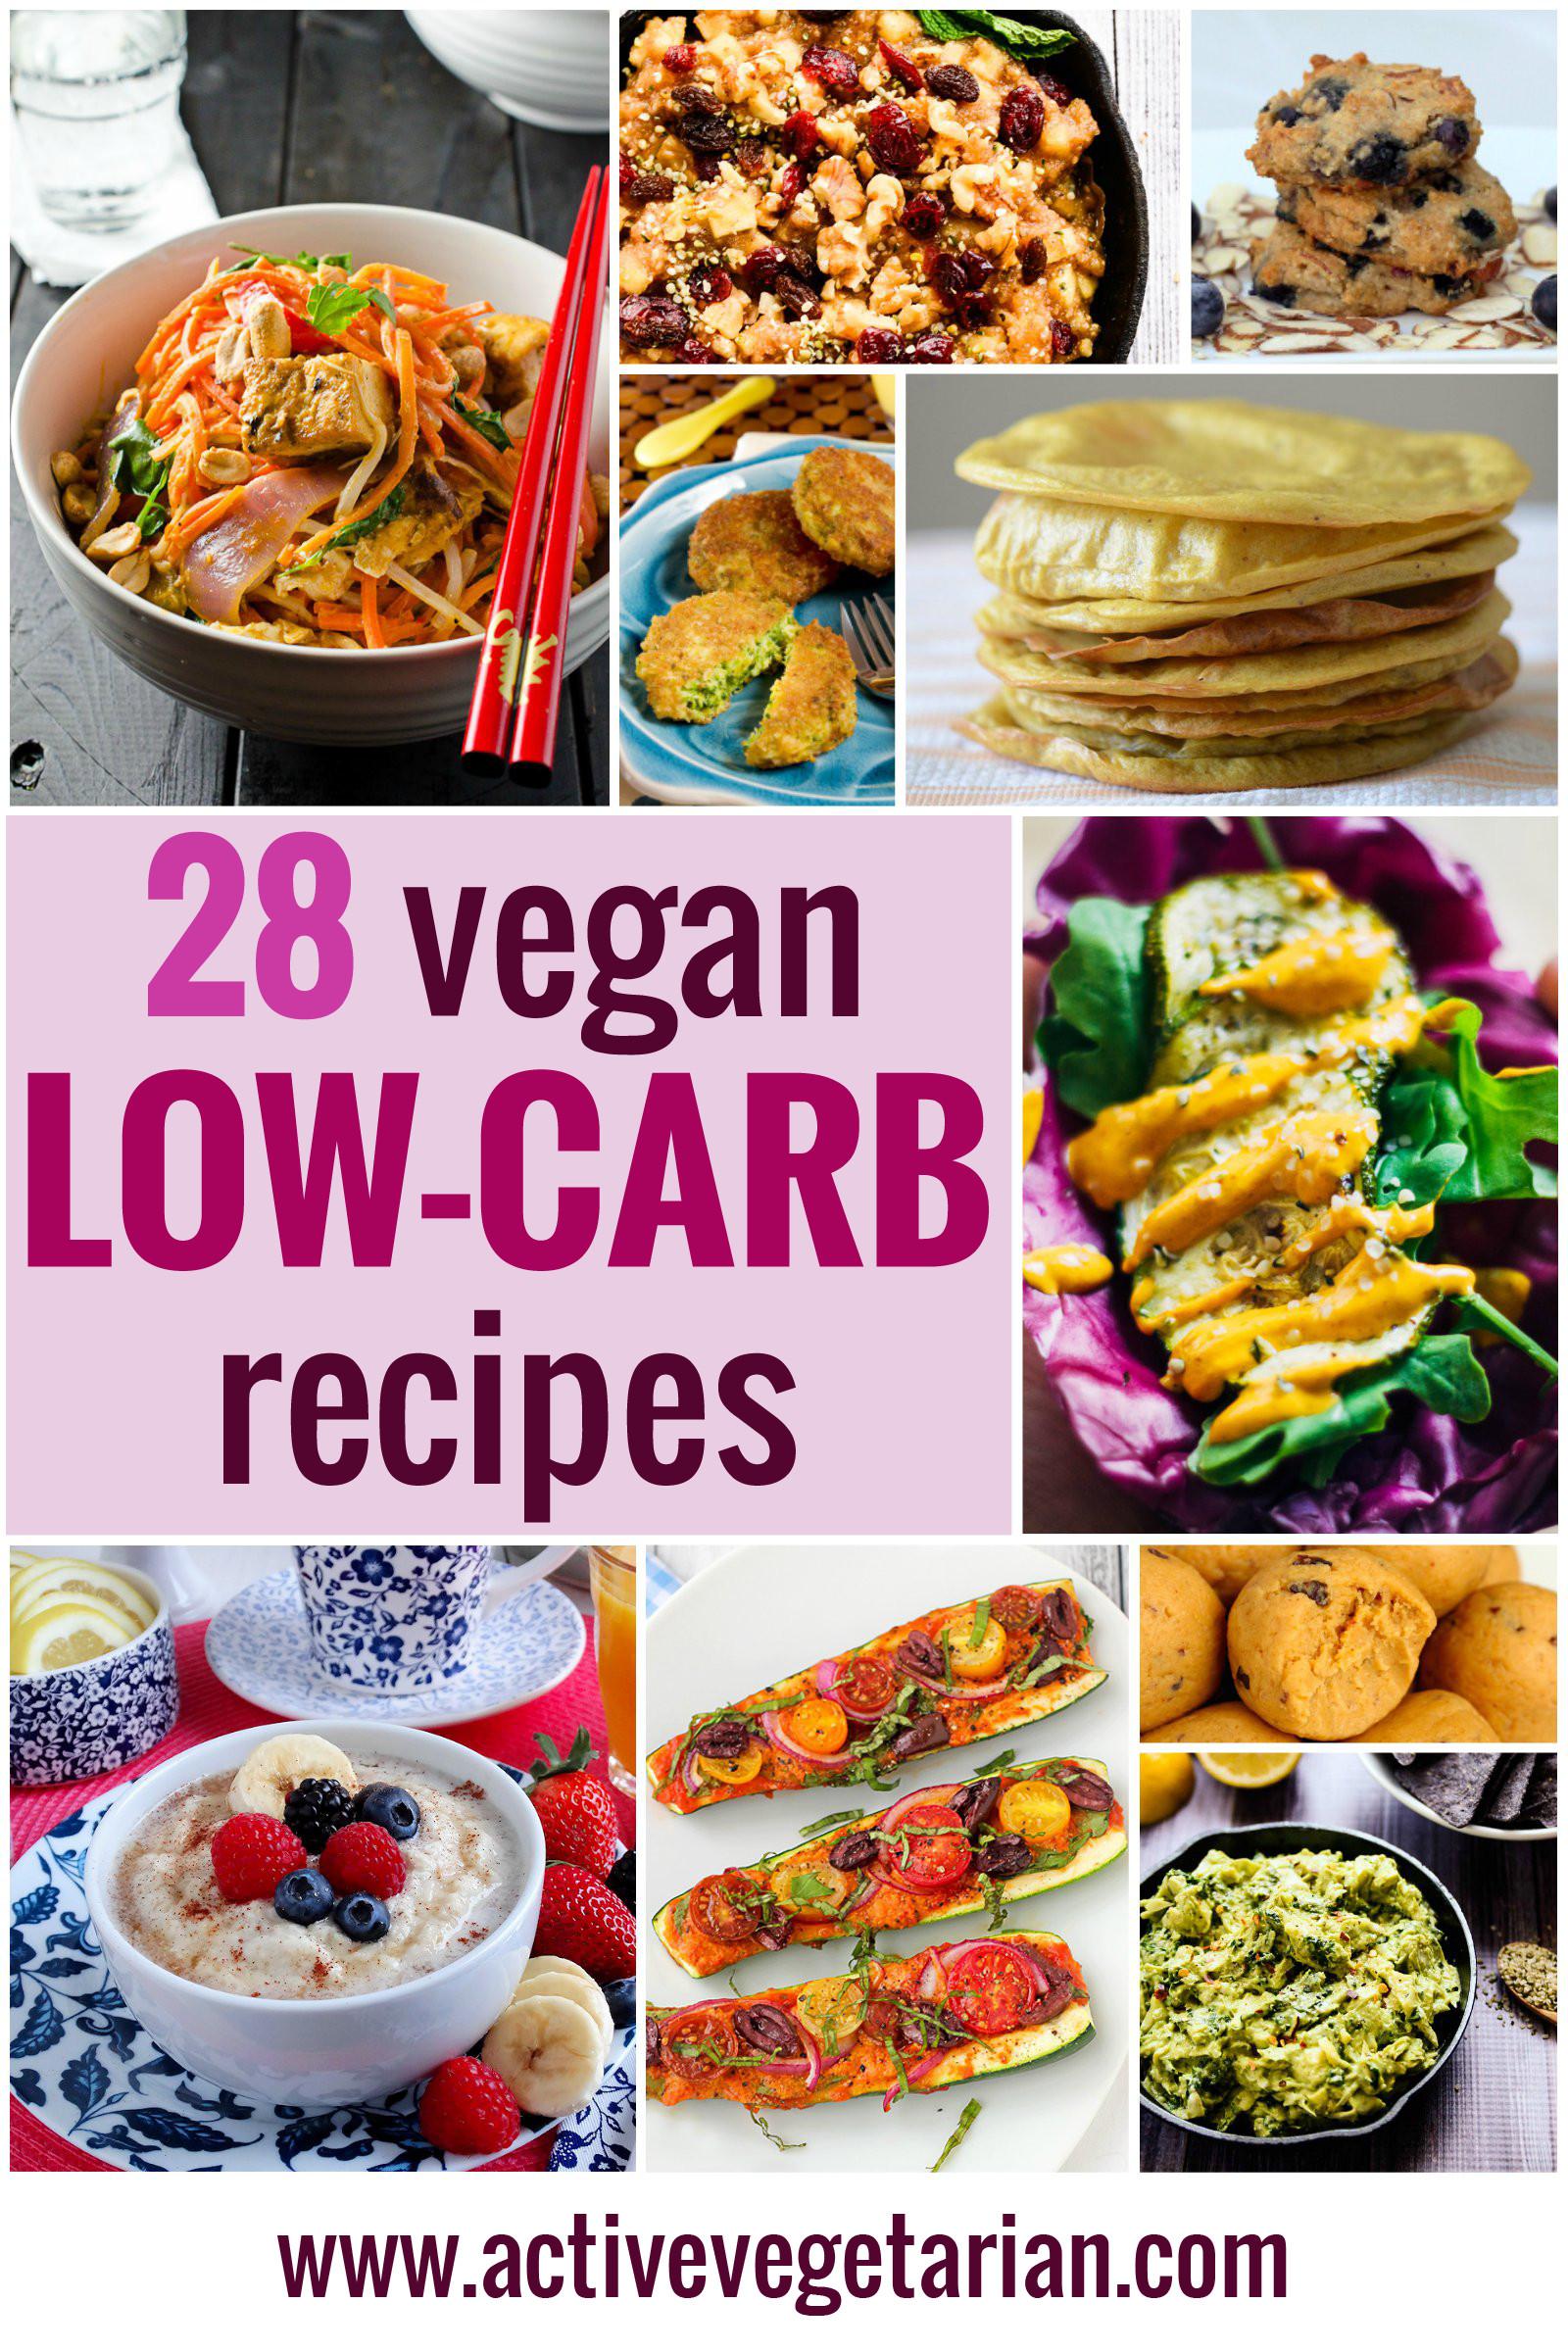 Low Carb Recipes Vegetarian  Recipe Round Up – 28 Low Carb Vegan Recipes